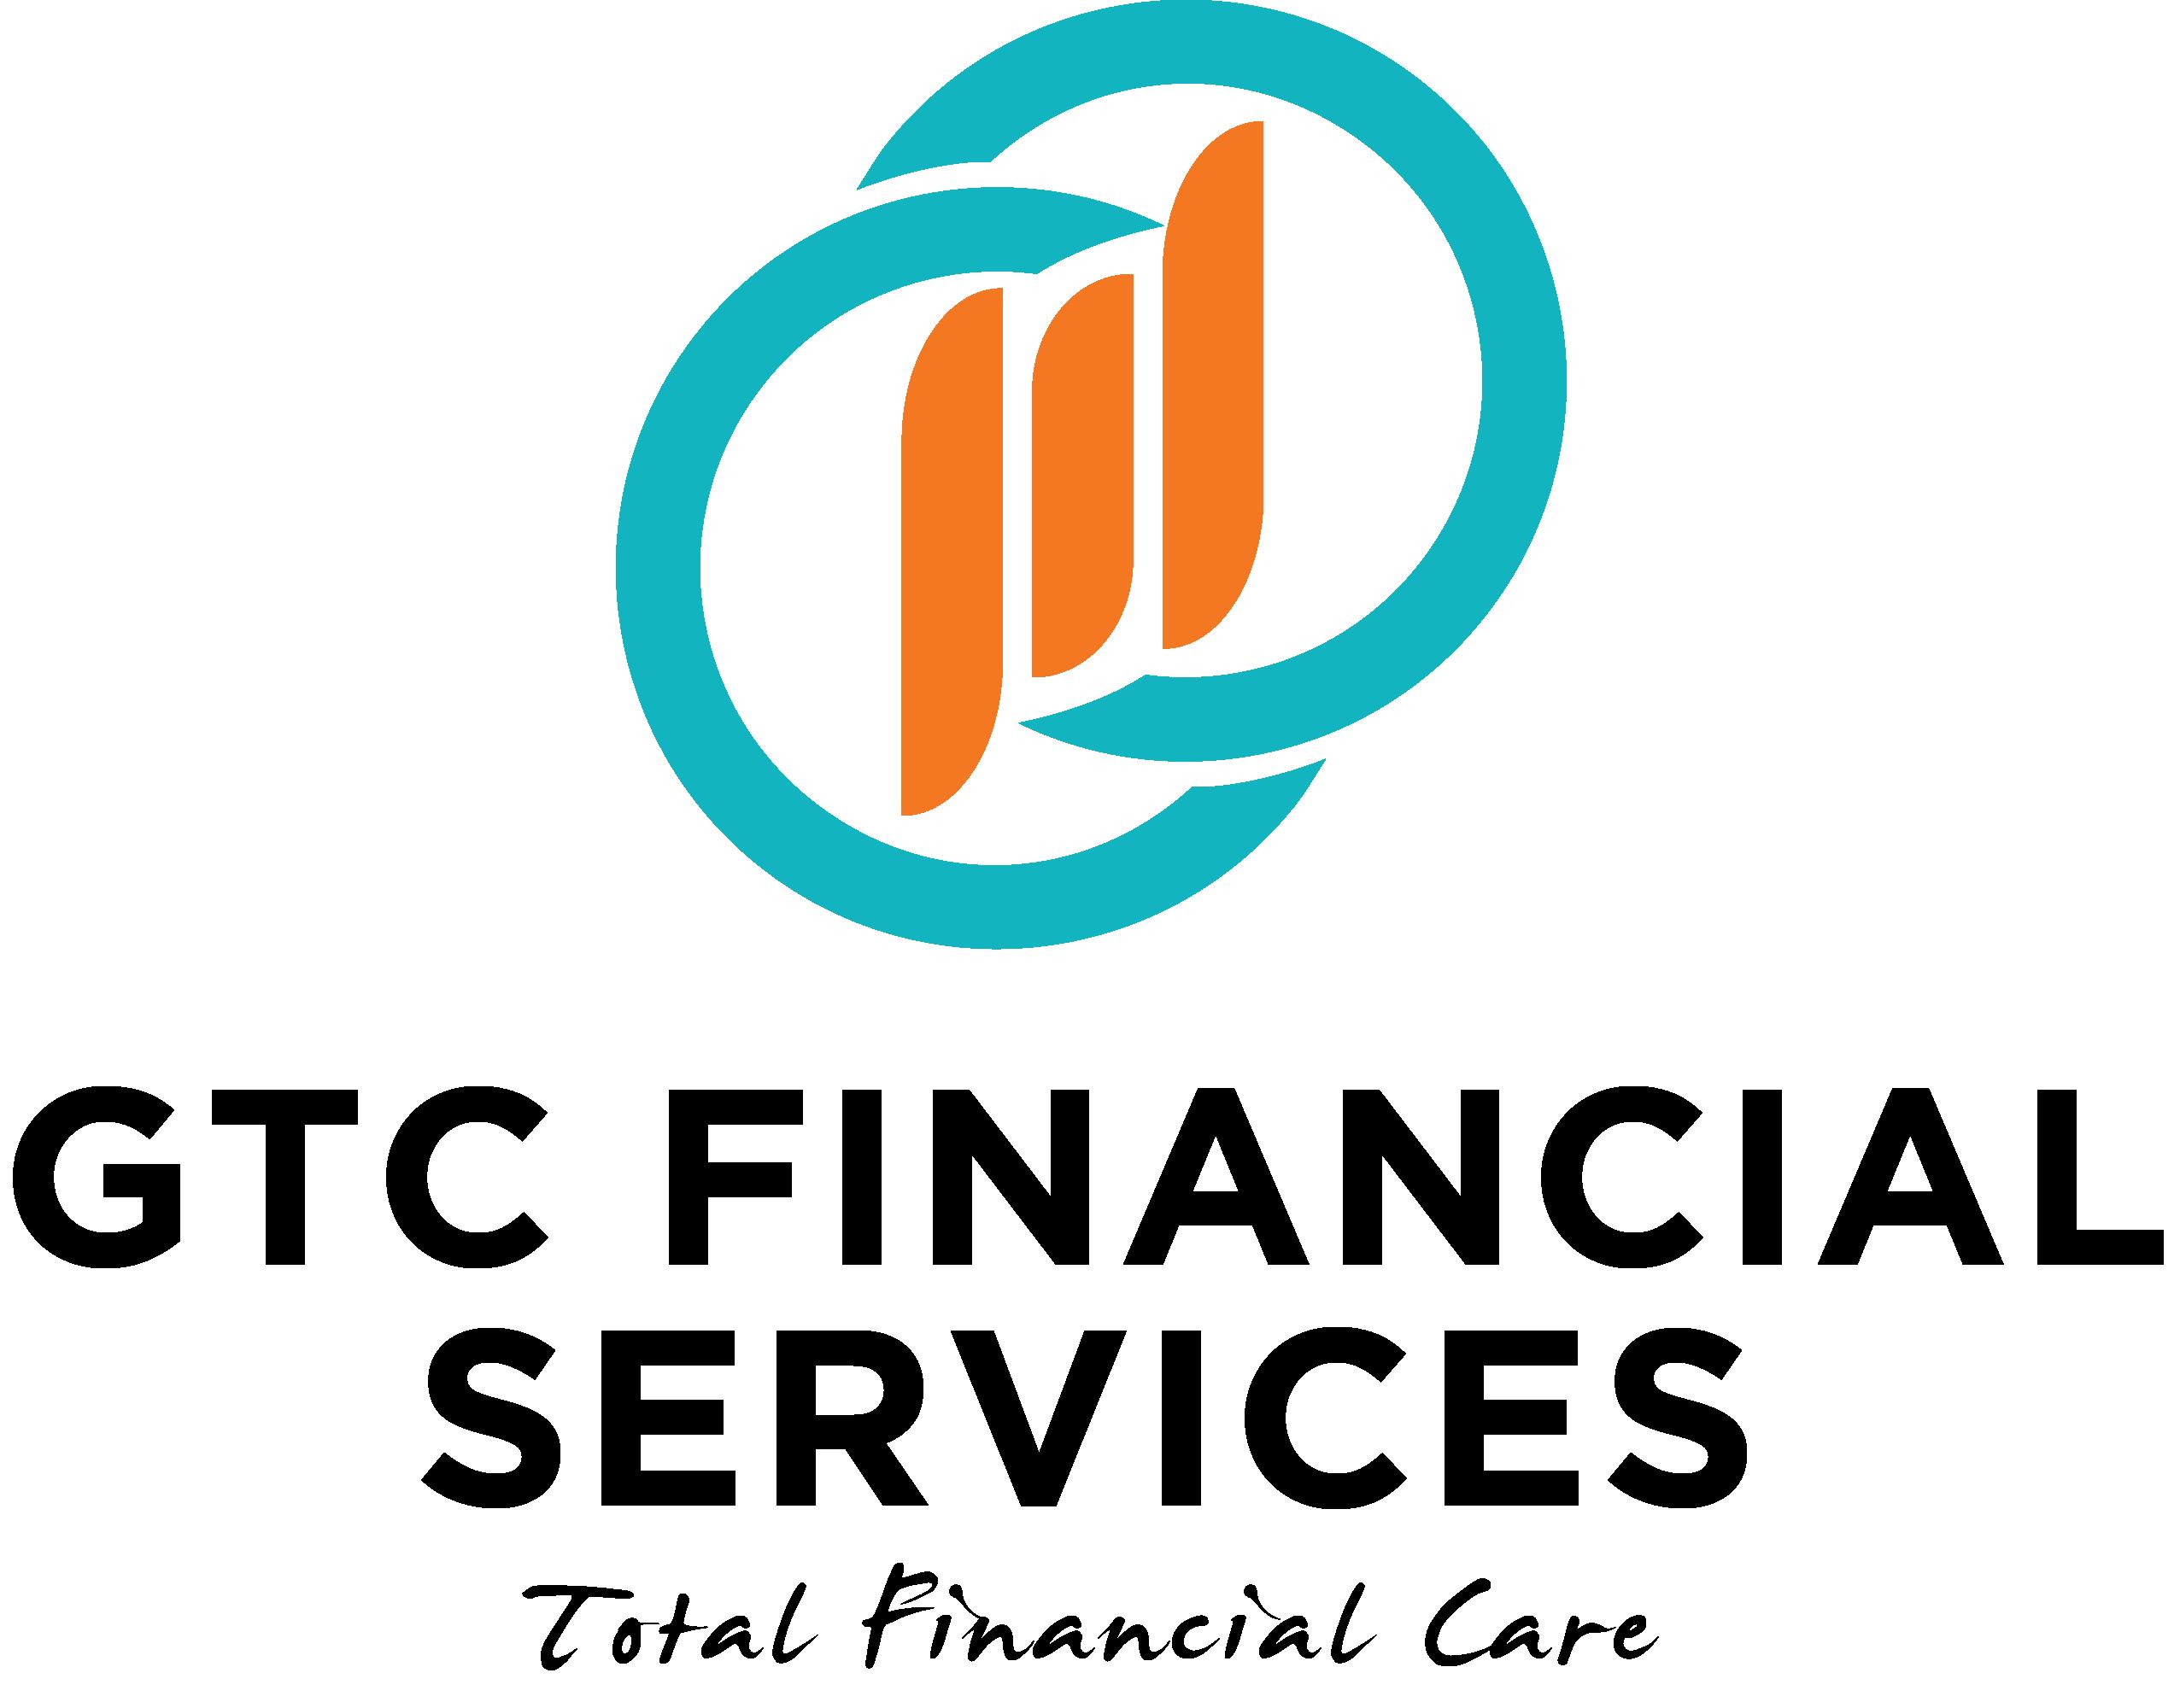 GTC Financial Services